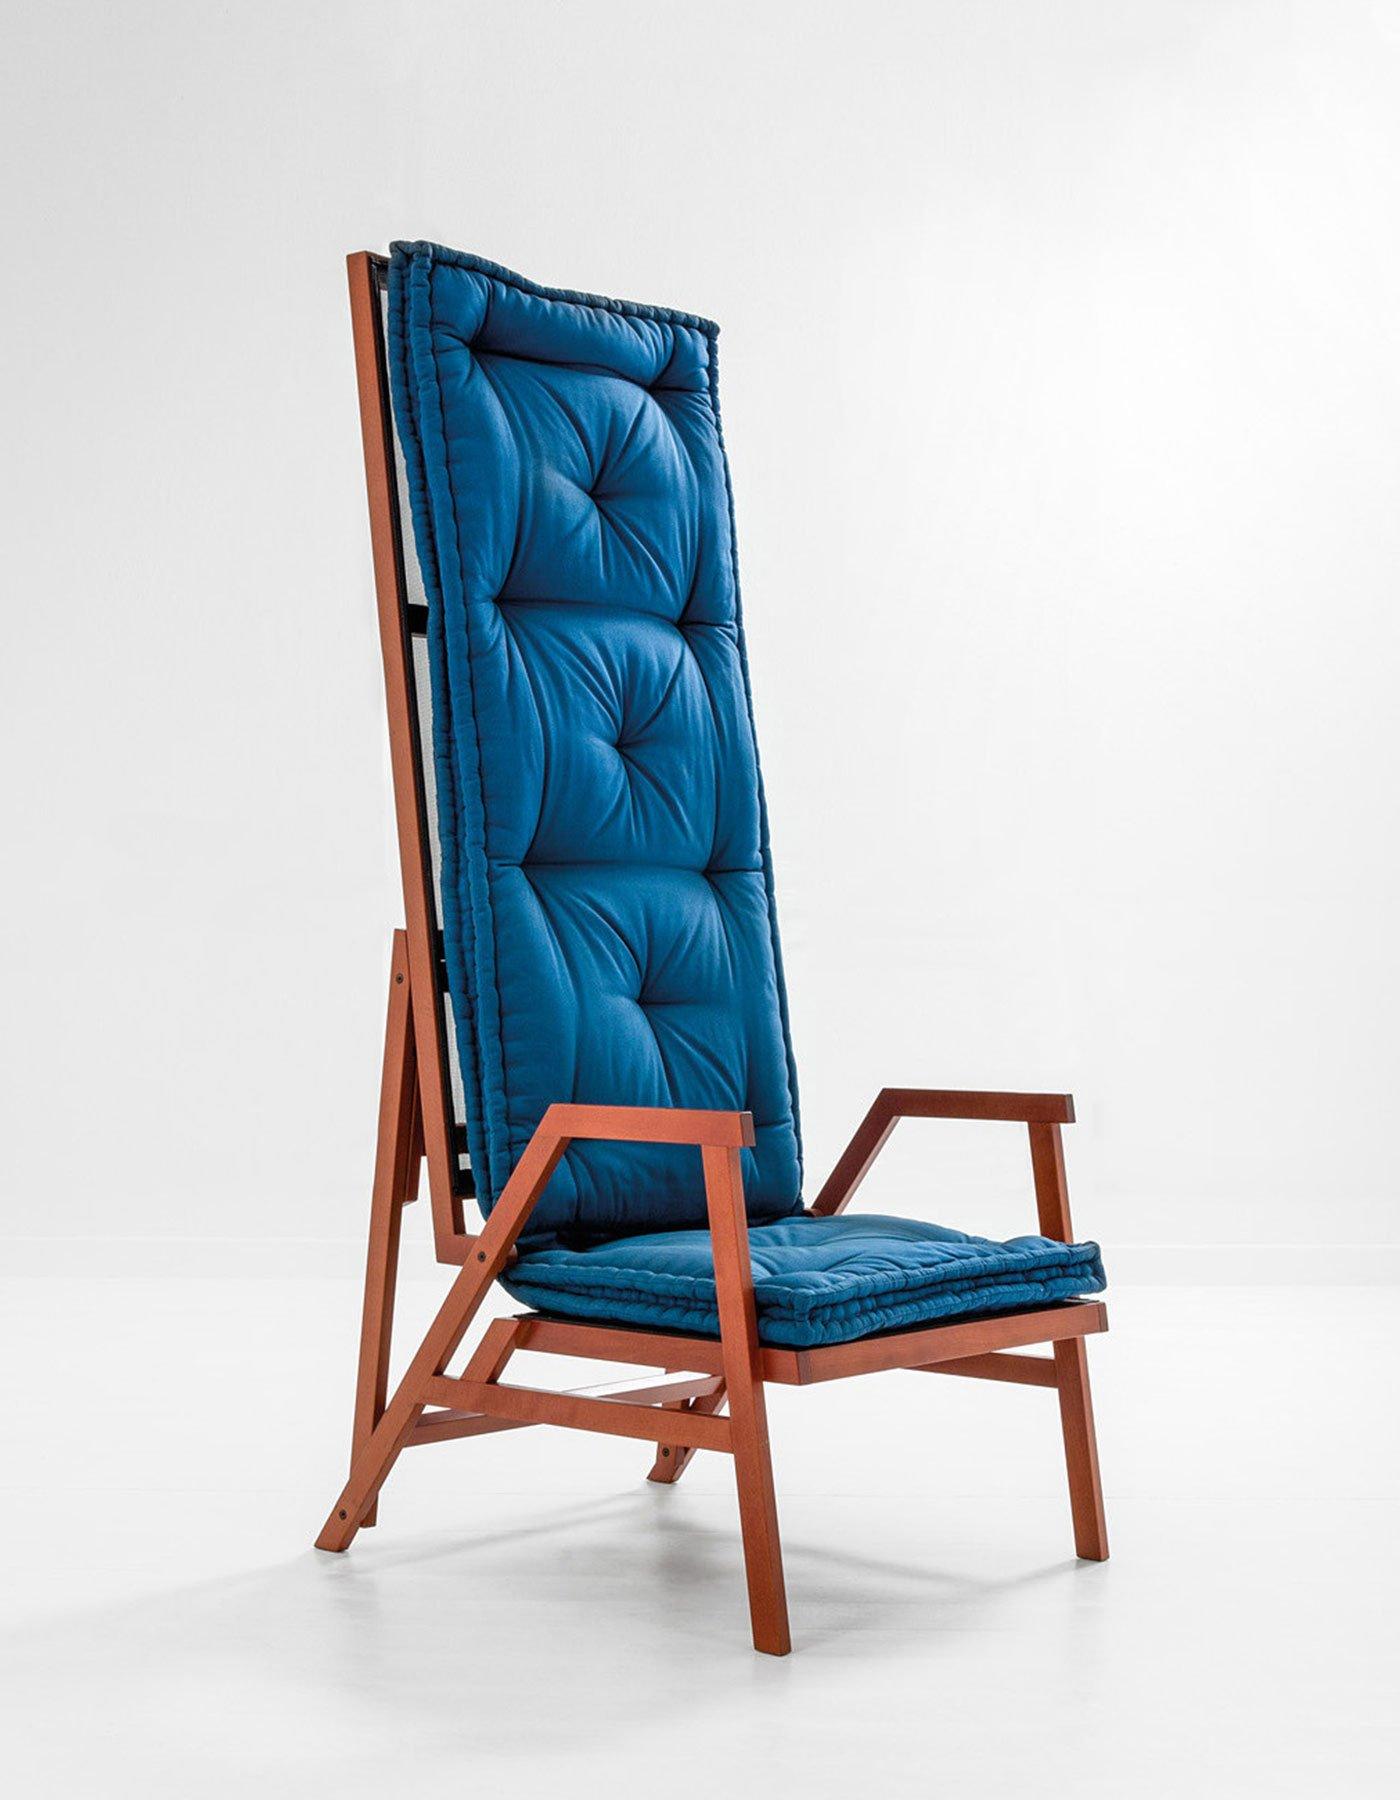 Achille Castiglioni  |  Armchair-bed model Polet